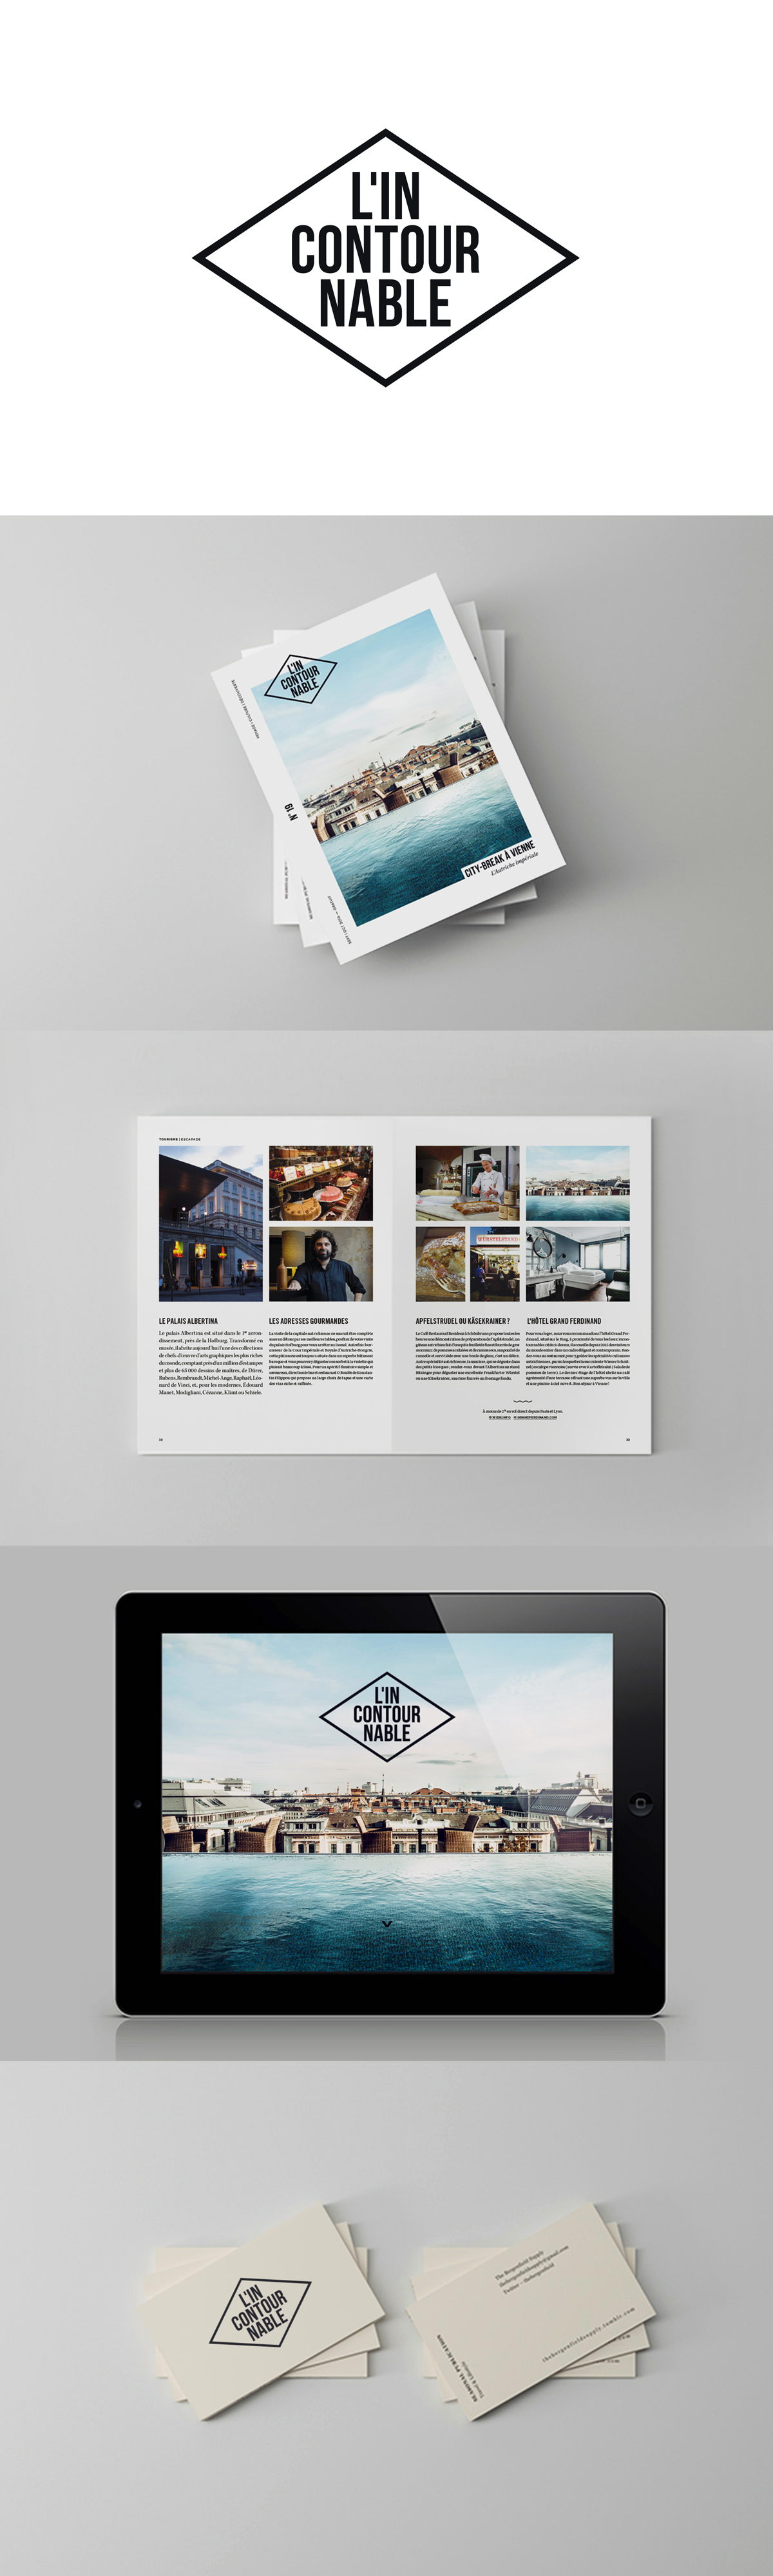 incontournable-magazine-design-studio-cosmos